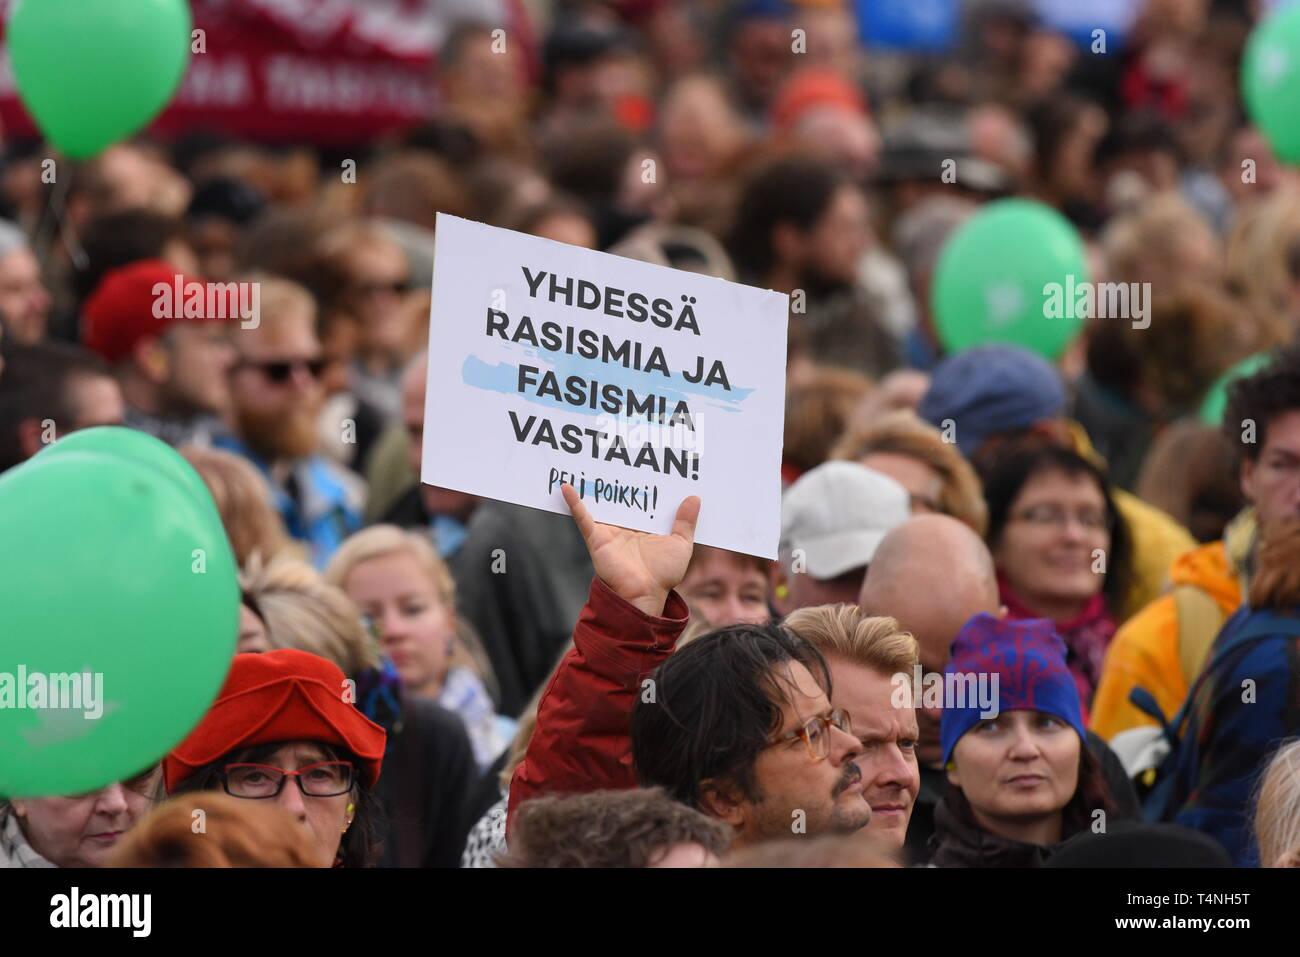 Helsinki, Finland - September 24, 2016: Peli poikki - Rikotaan hiljaisuus - protest rally against racism and right wing extremist violence in Helsinki Stock Photo